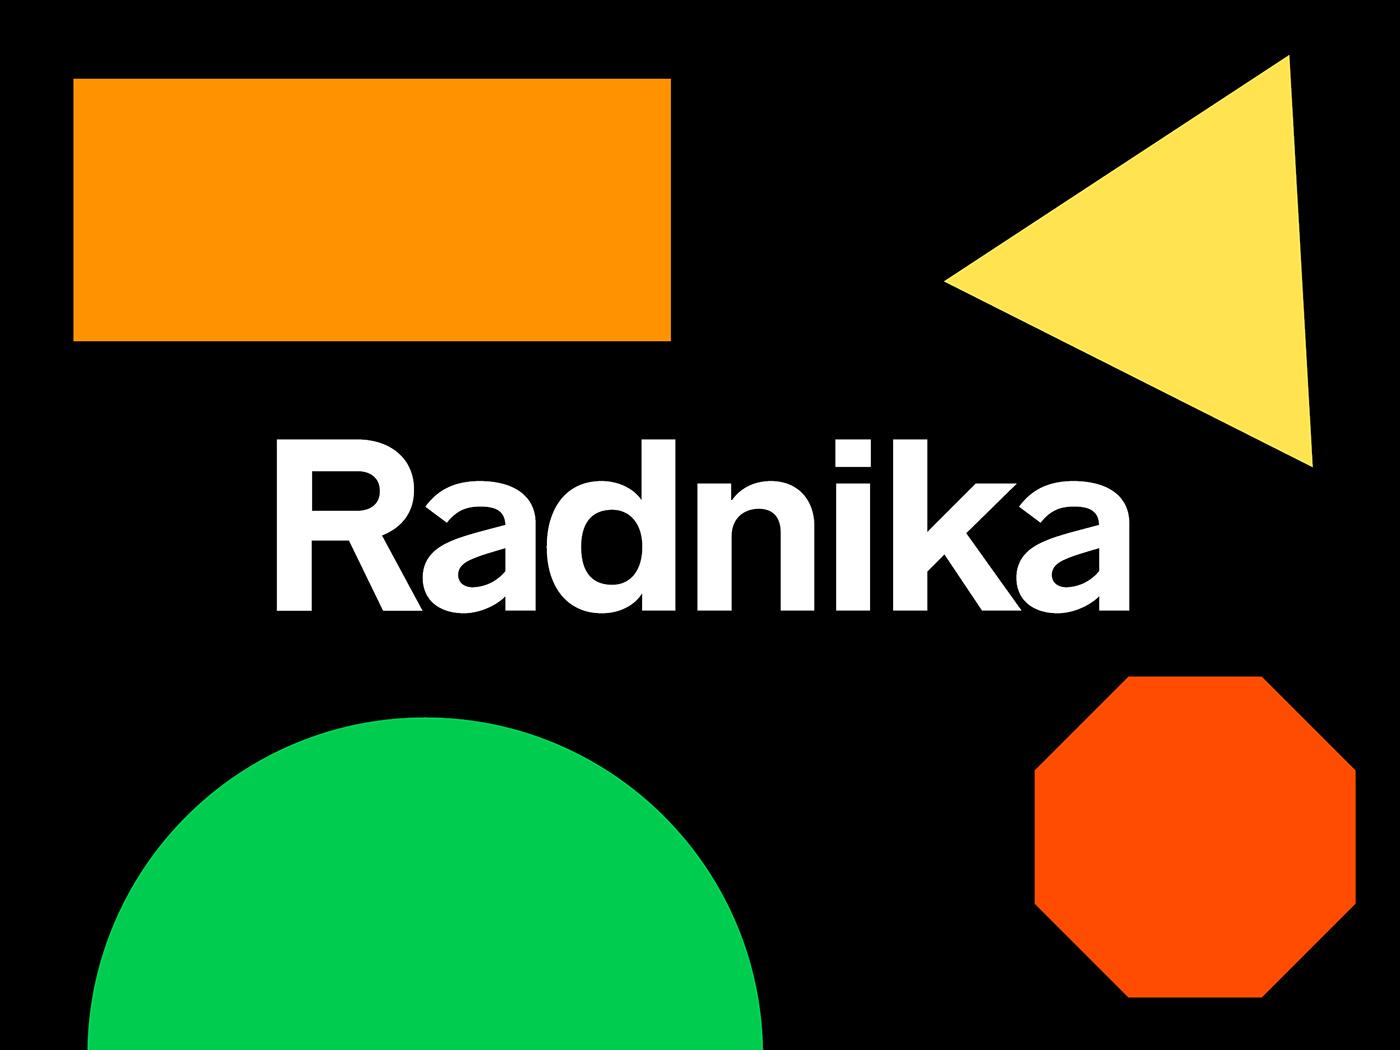 radnika gothic Workhorse sans serif Typeface font free Trade Gothic akzidenz grotesk